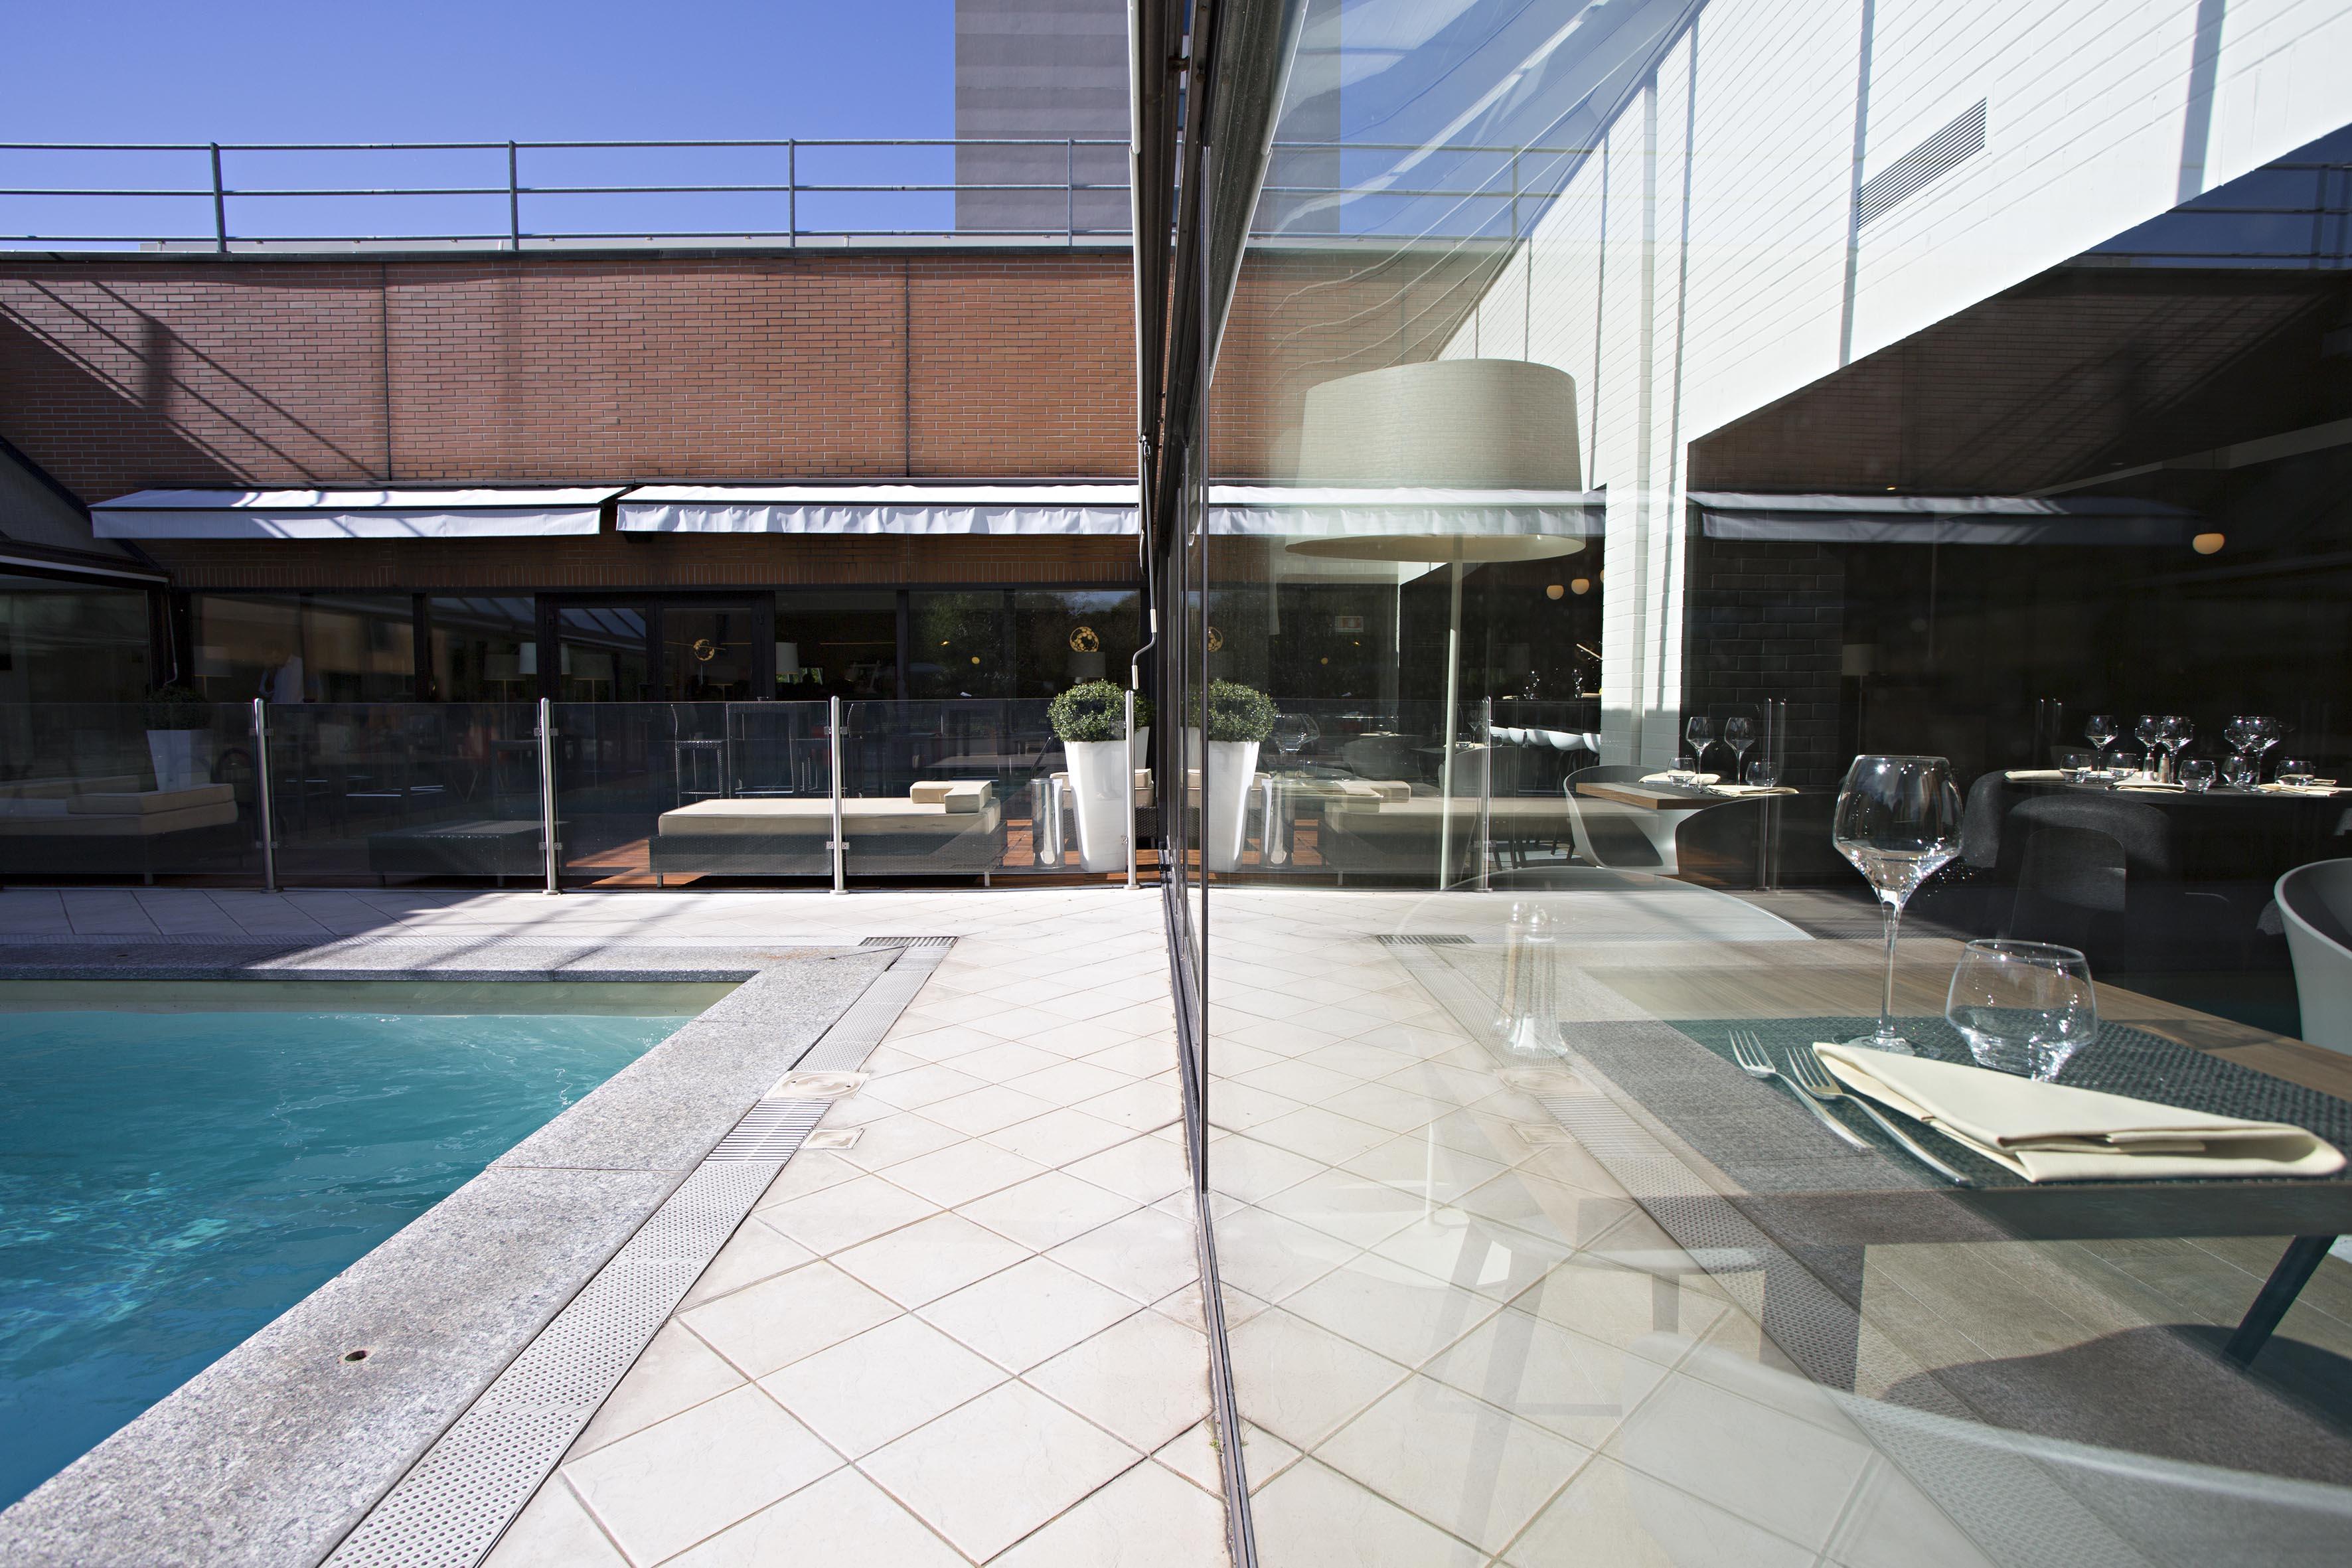 Novotel_Linate_piscina